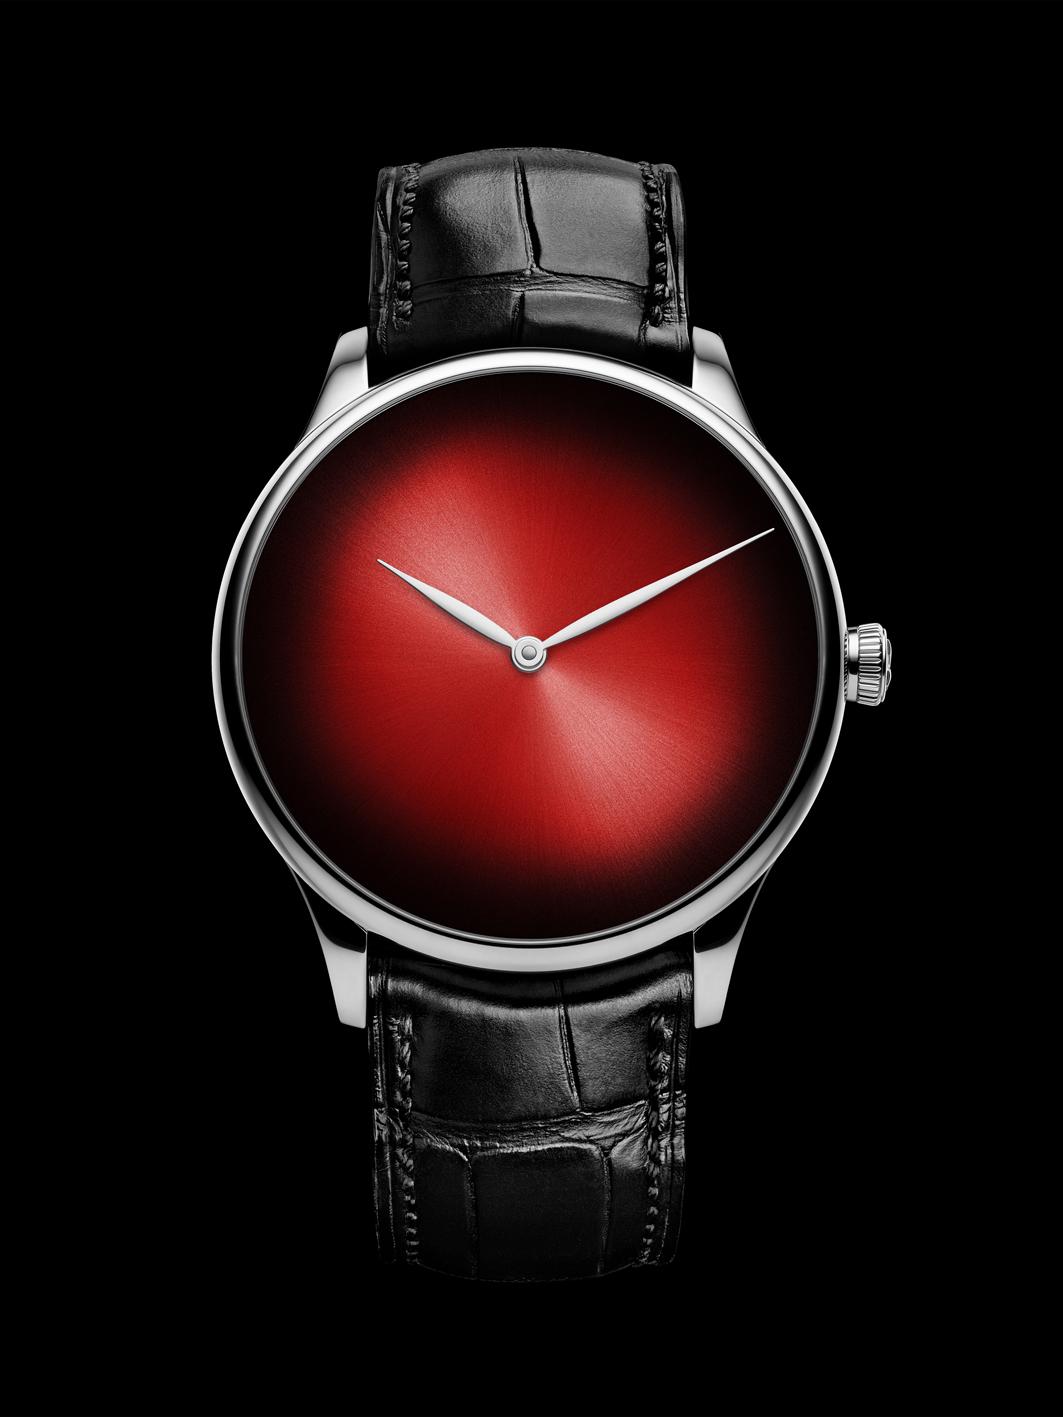 H. Moser Venturer Concept Only Watch Background_RGB